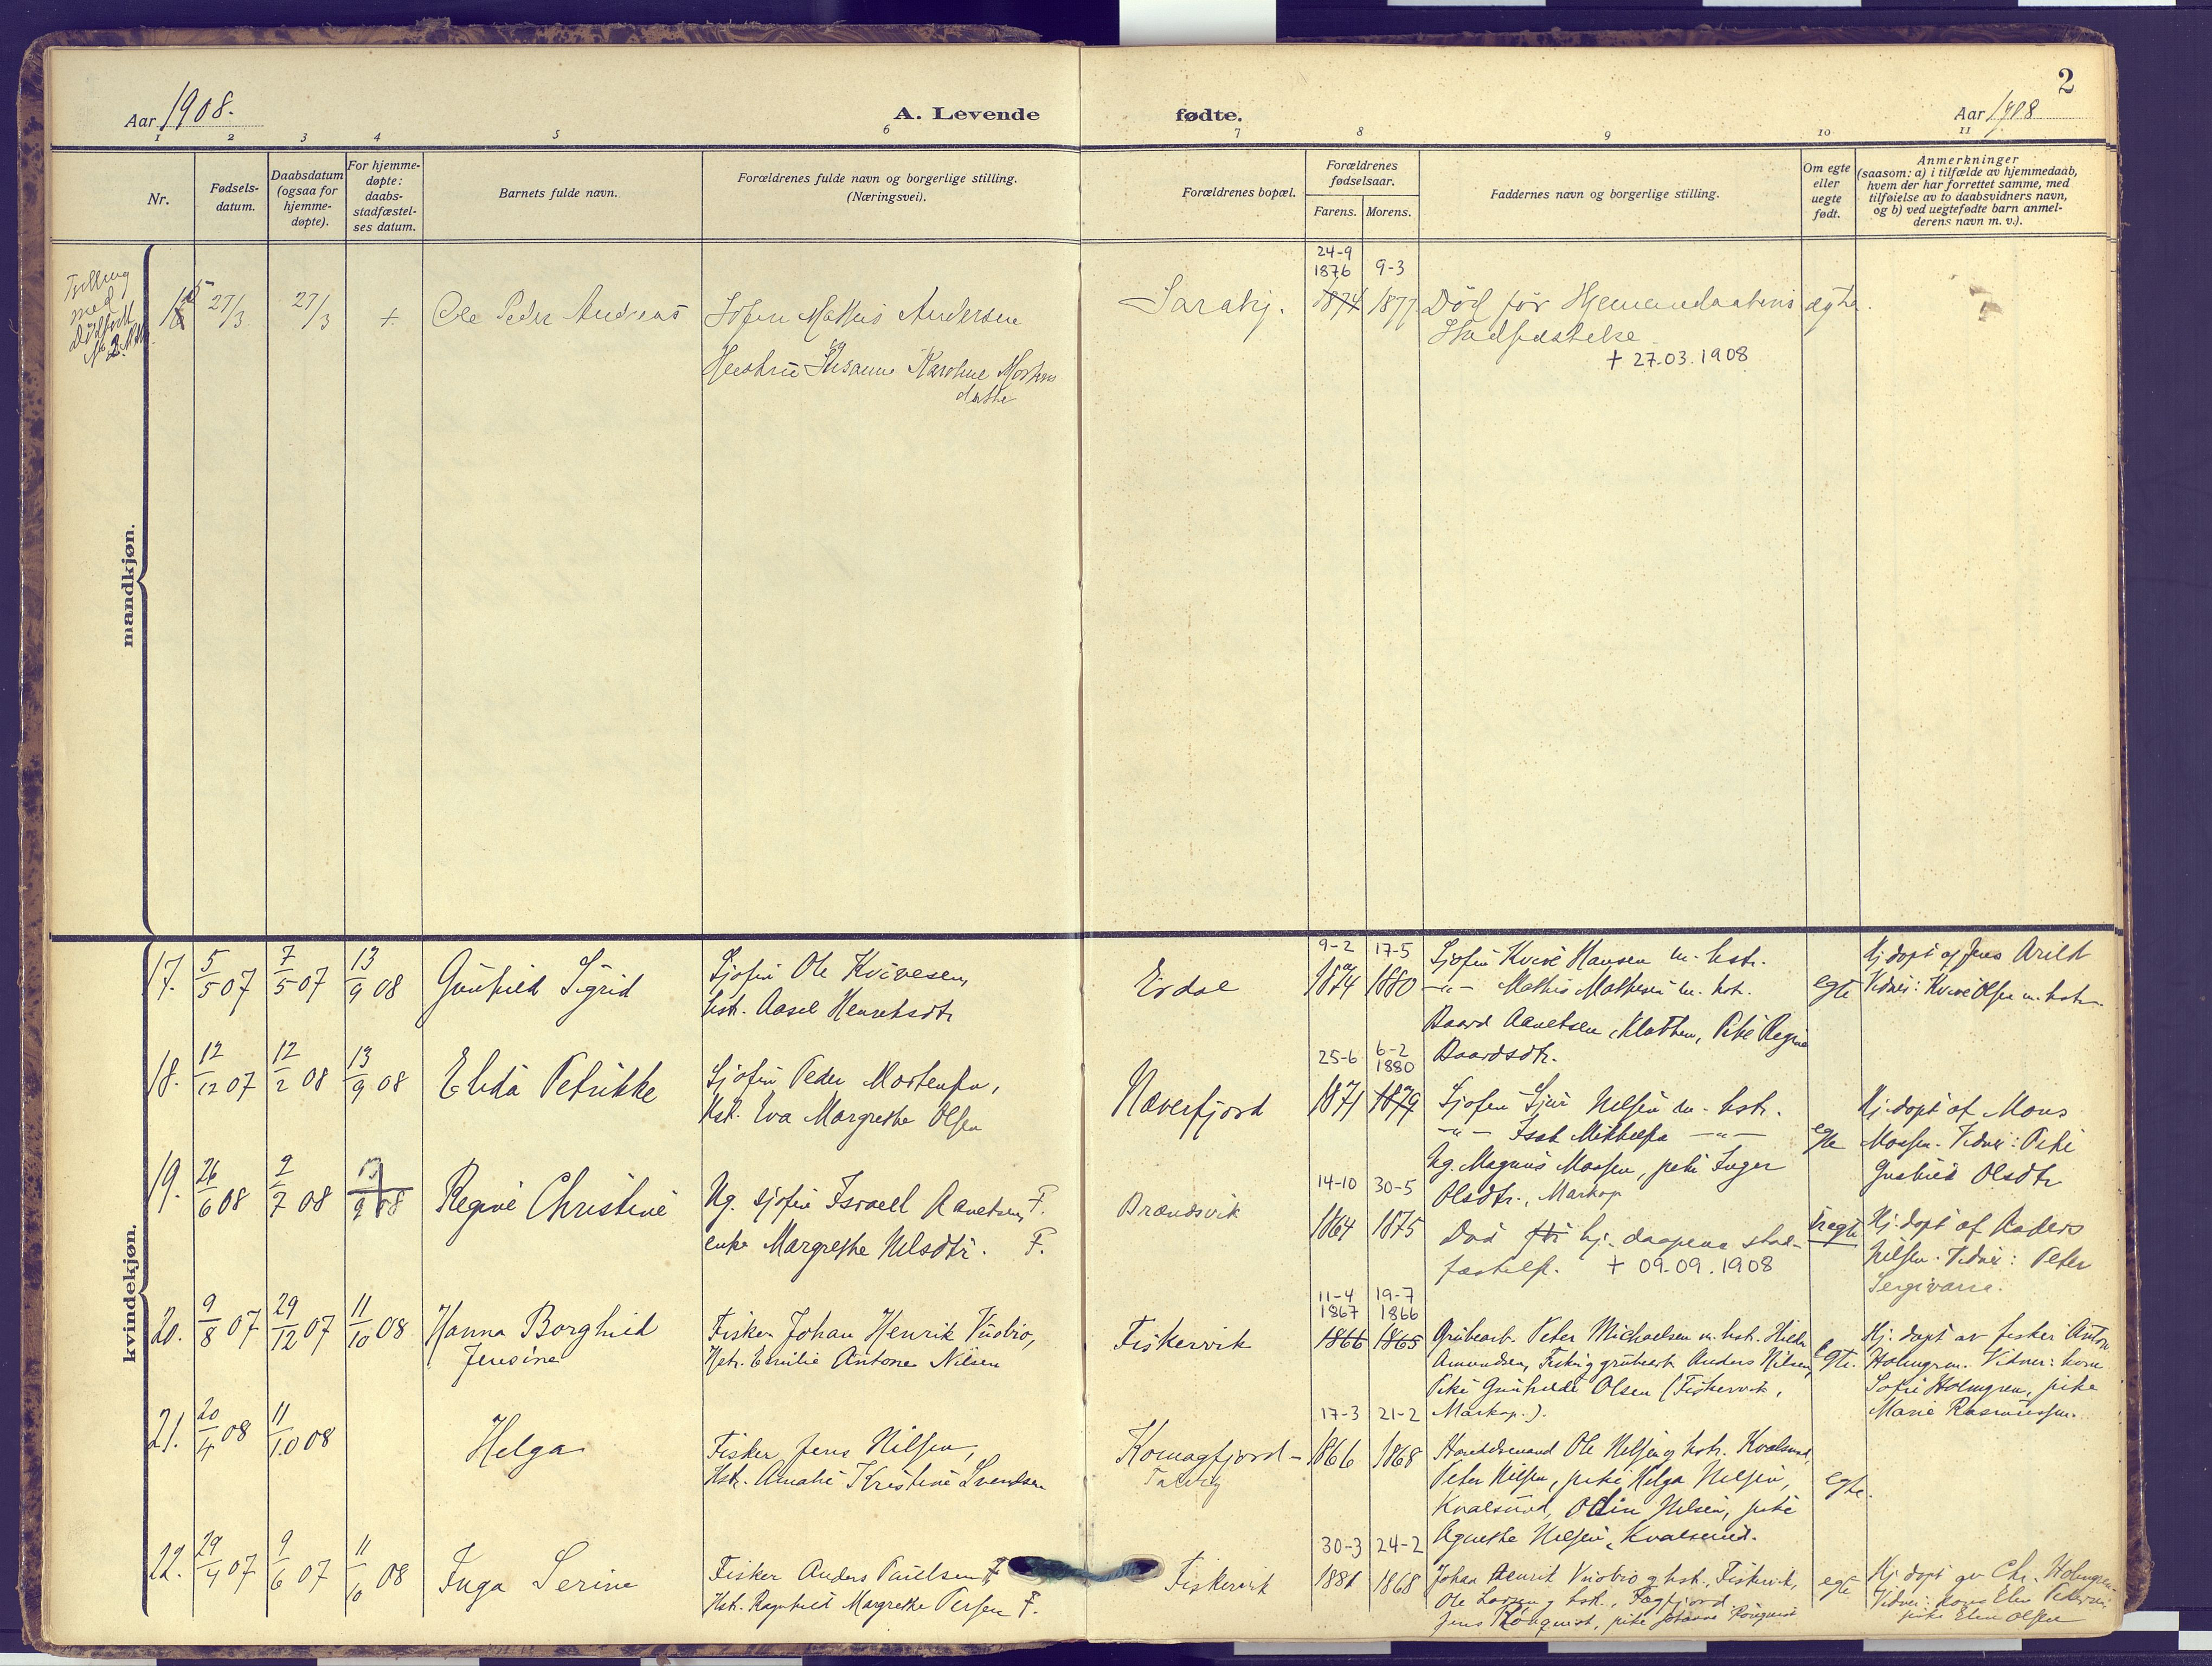 SATØ, Hammerfest sokneprestembete, Ministerialbok nr. 16, 1908-1923, s. 2